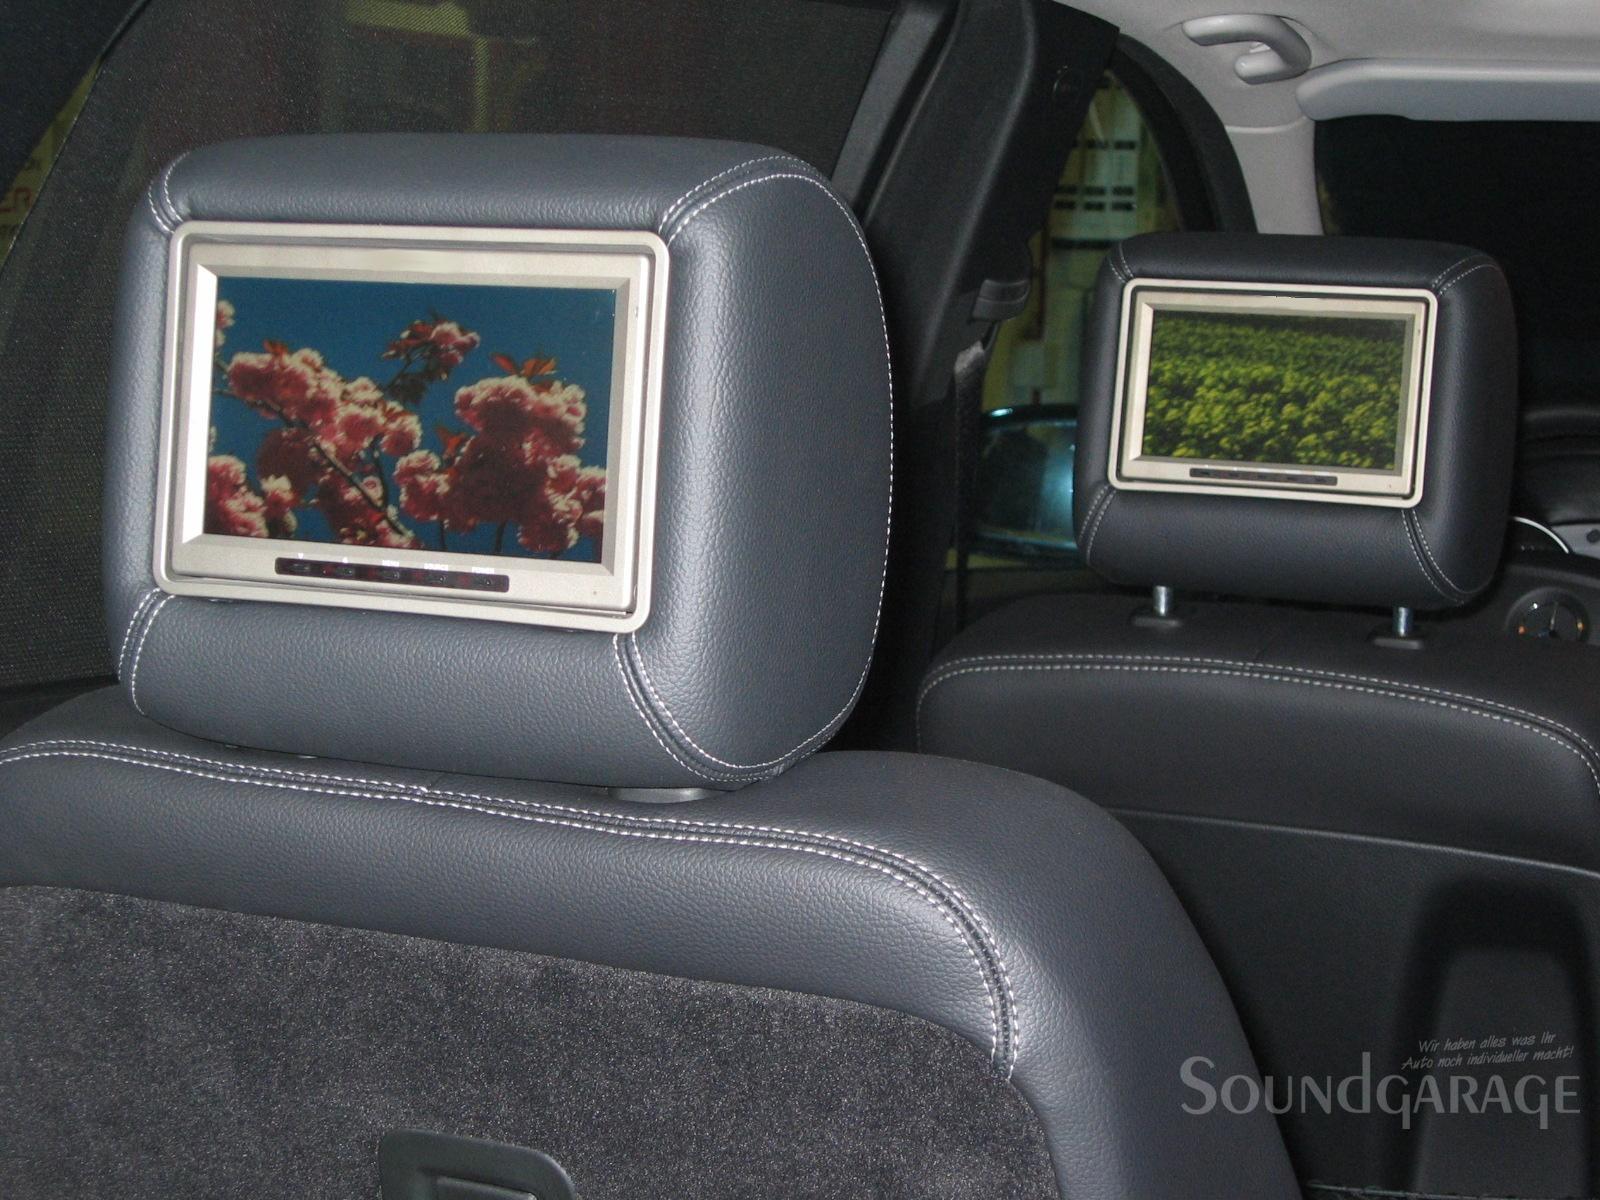 Mercedes benz r klasse dual rear seat entertainment system for Mercedes benz rear seat entertainment system